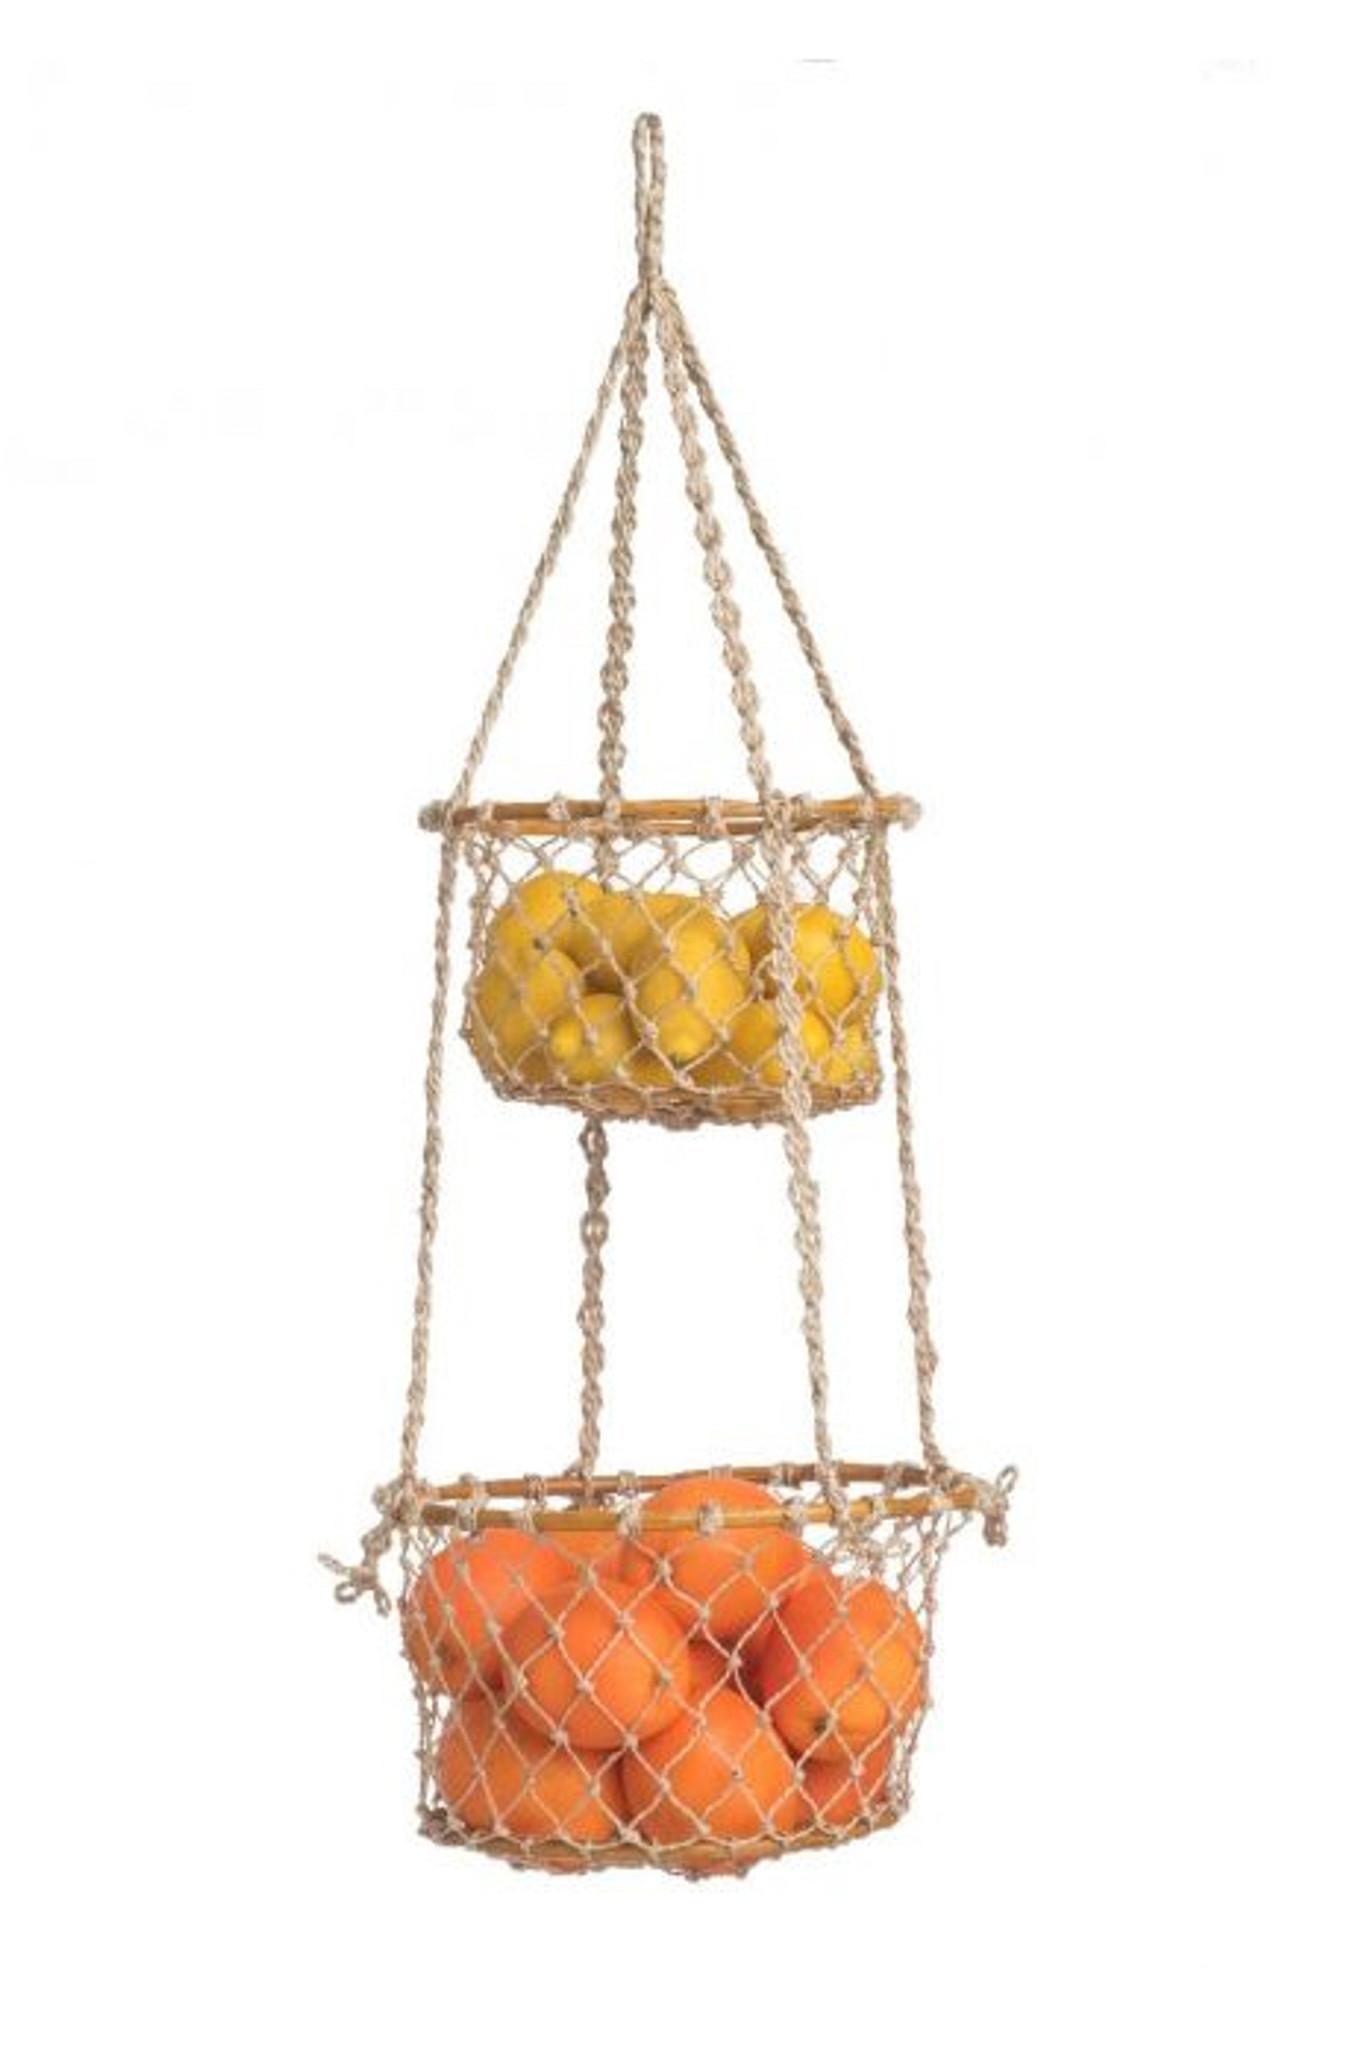 2 Tier Hanging Basket